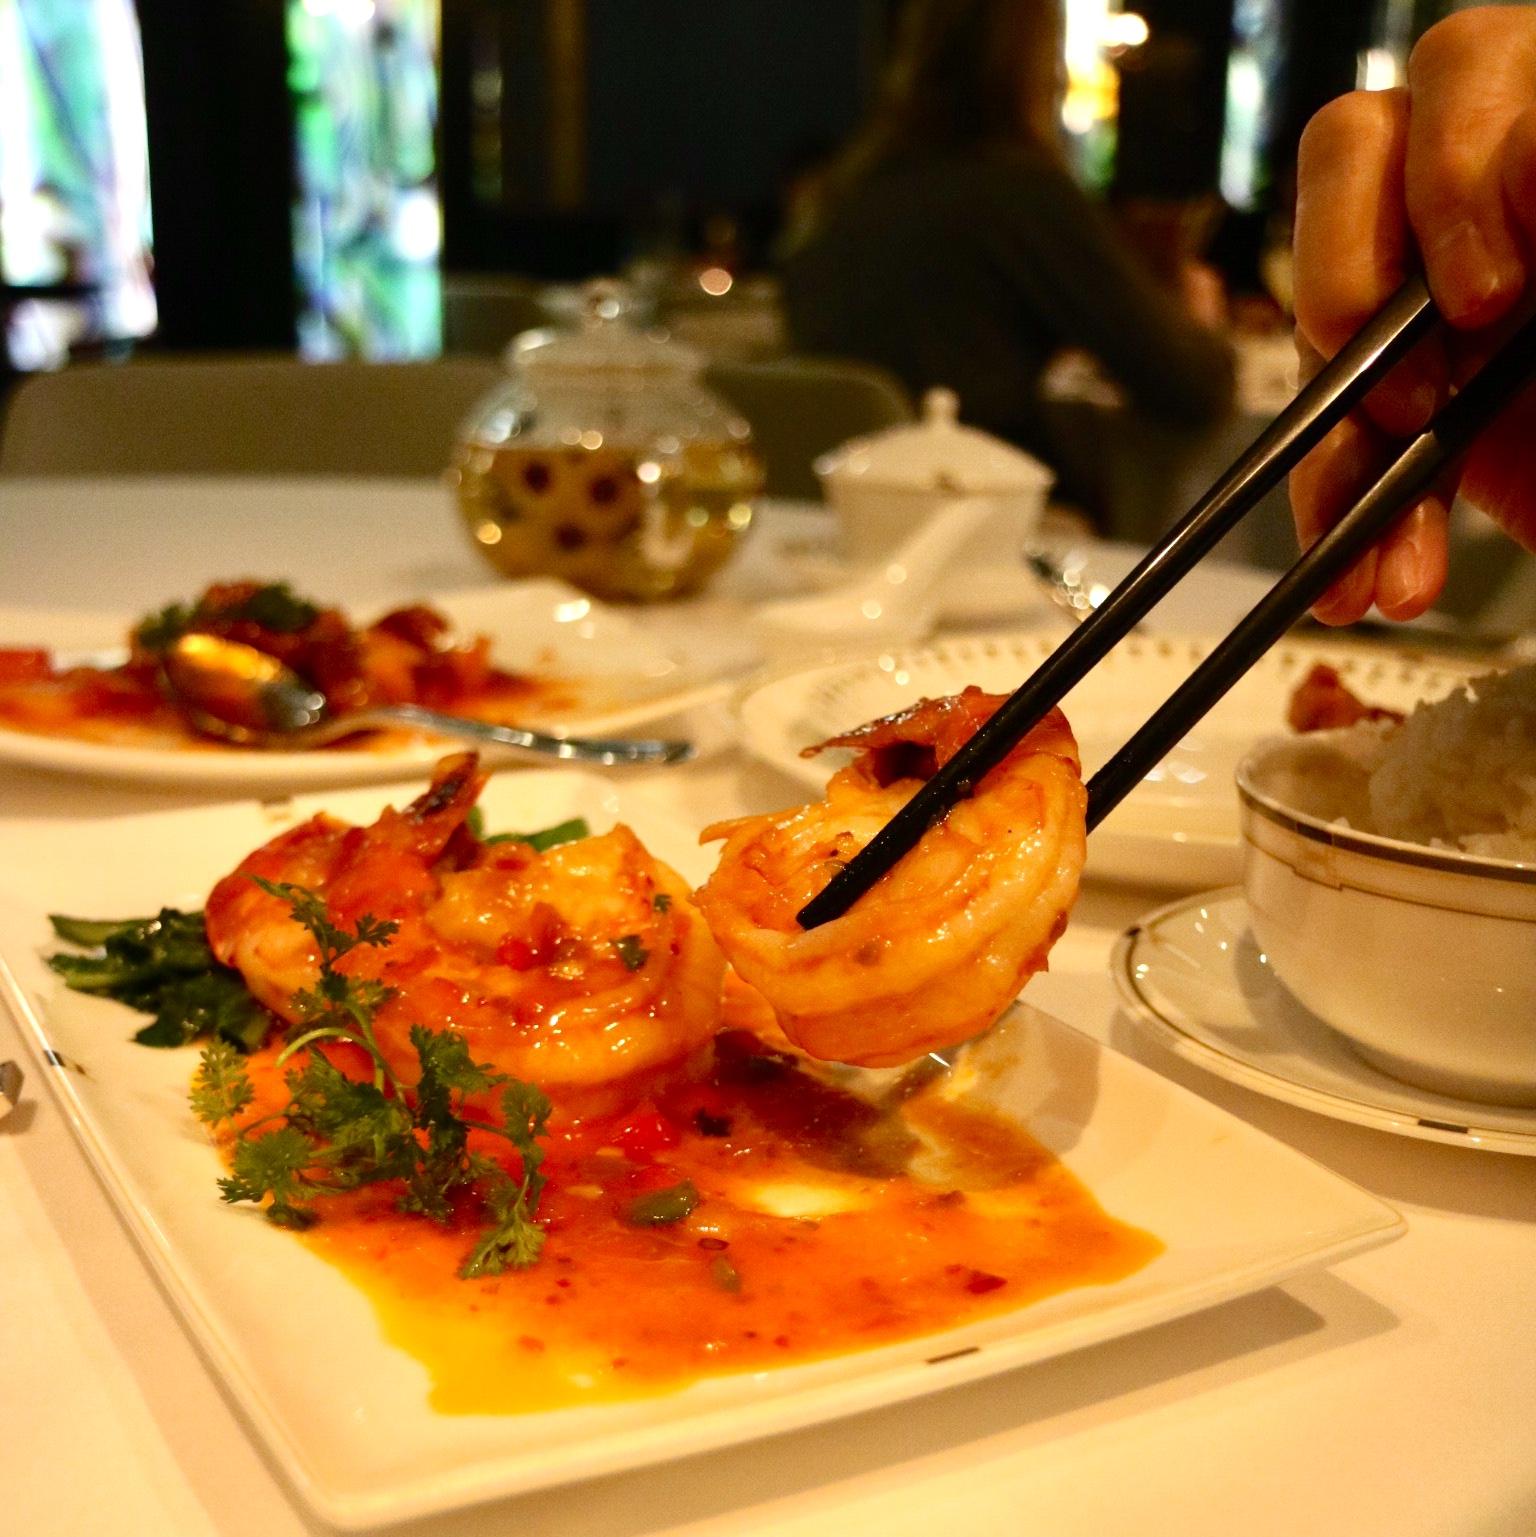 Sichuan Chili Prawns